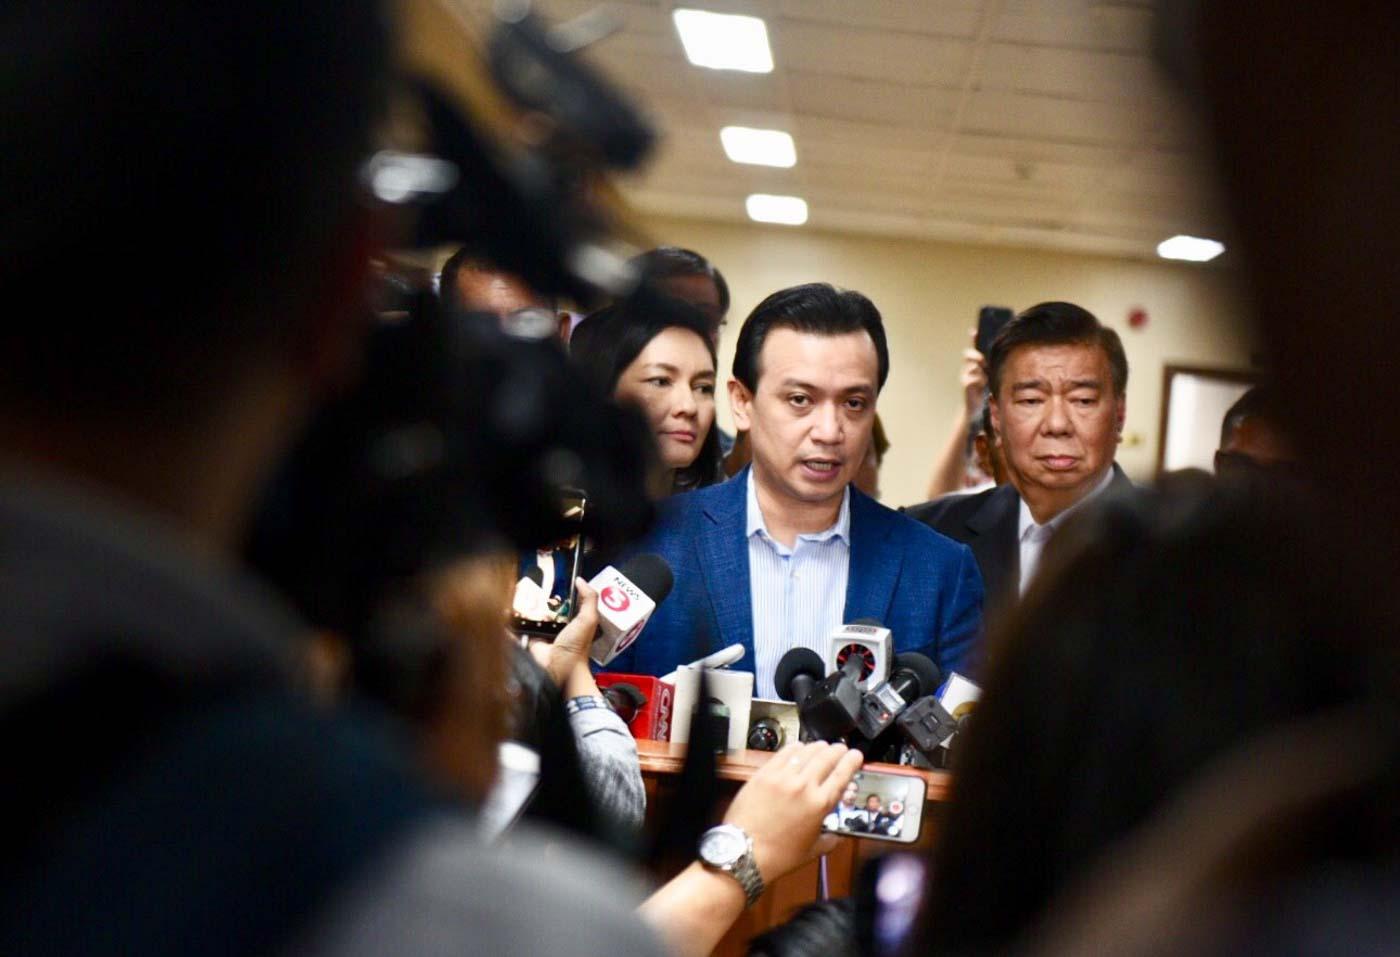 MISSING APPLICATION? Senator Antonio Trillanes IV speaks to reporters on Tuesday, September 4, 2018. Photo by Leanne Jazul/Rappler